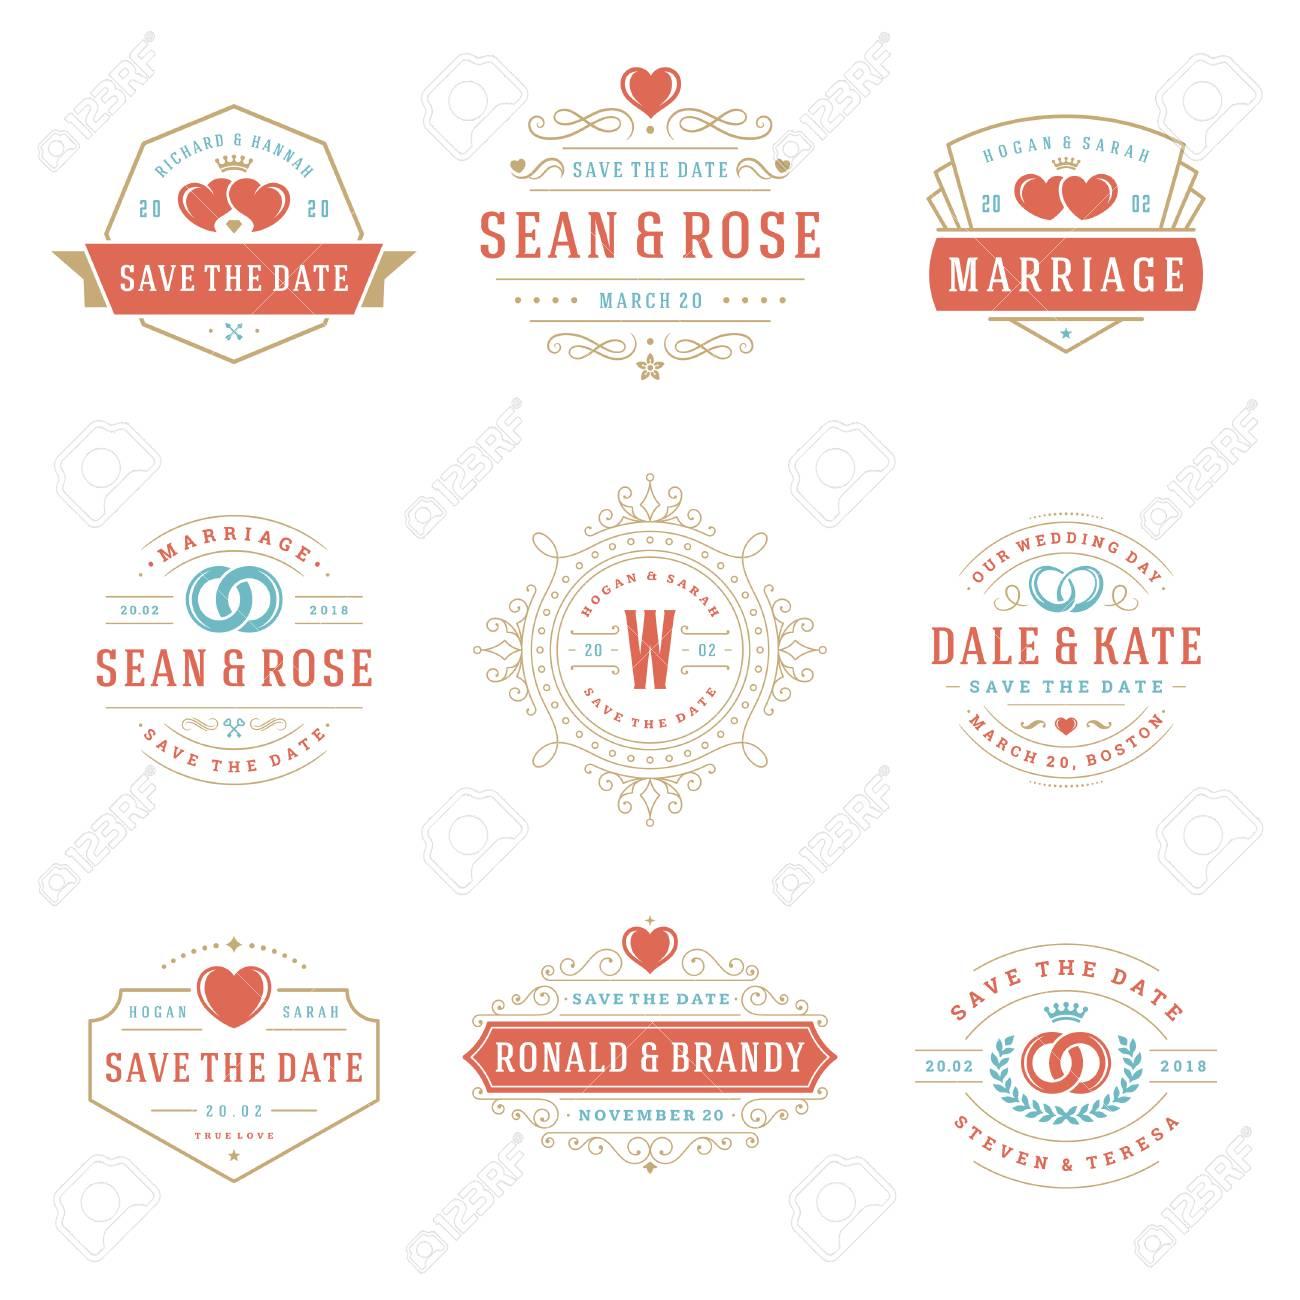 Wedding Logos And Badges Vector And Design Elements Set. Vintage ...